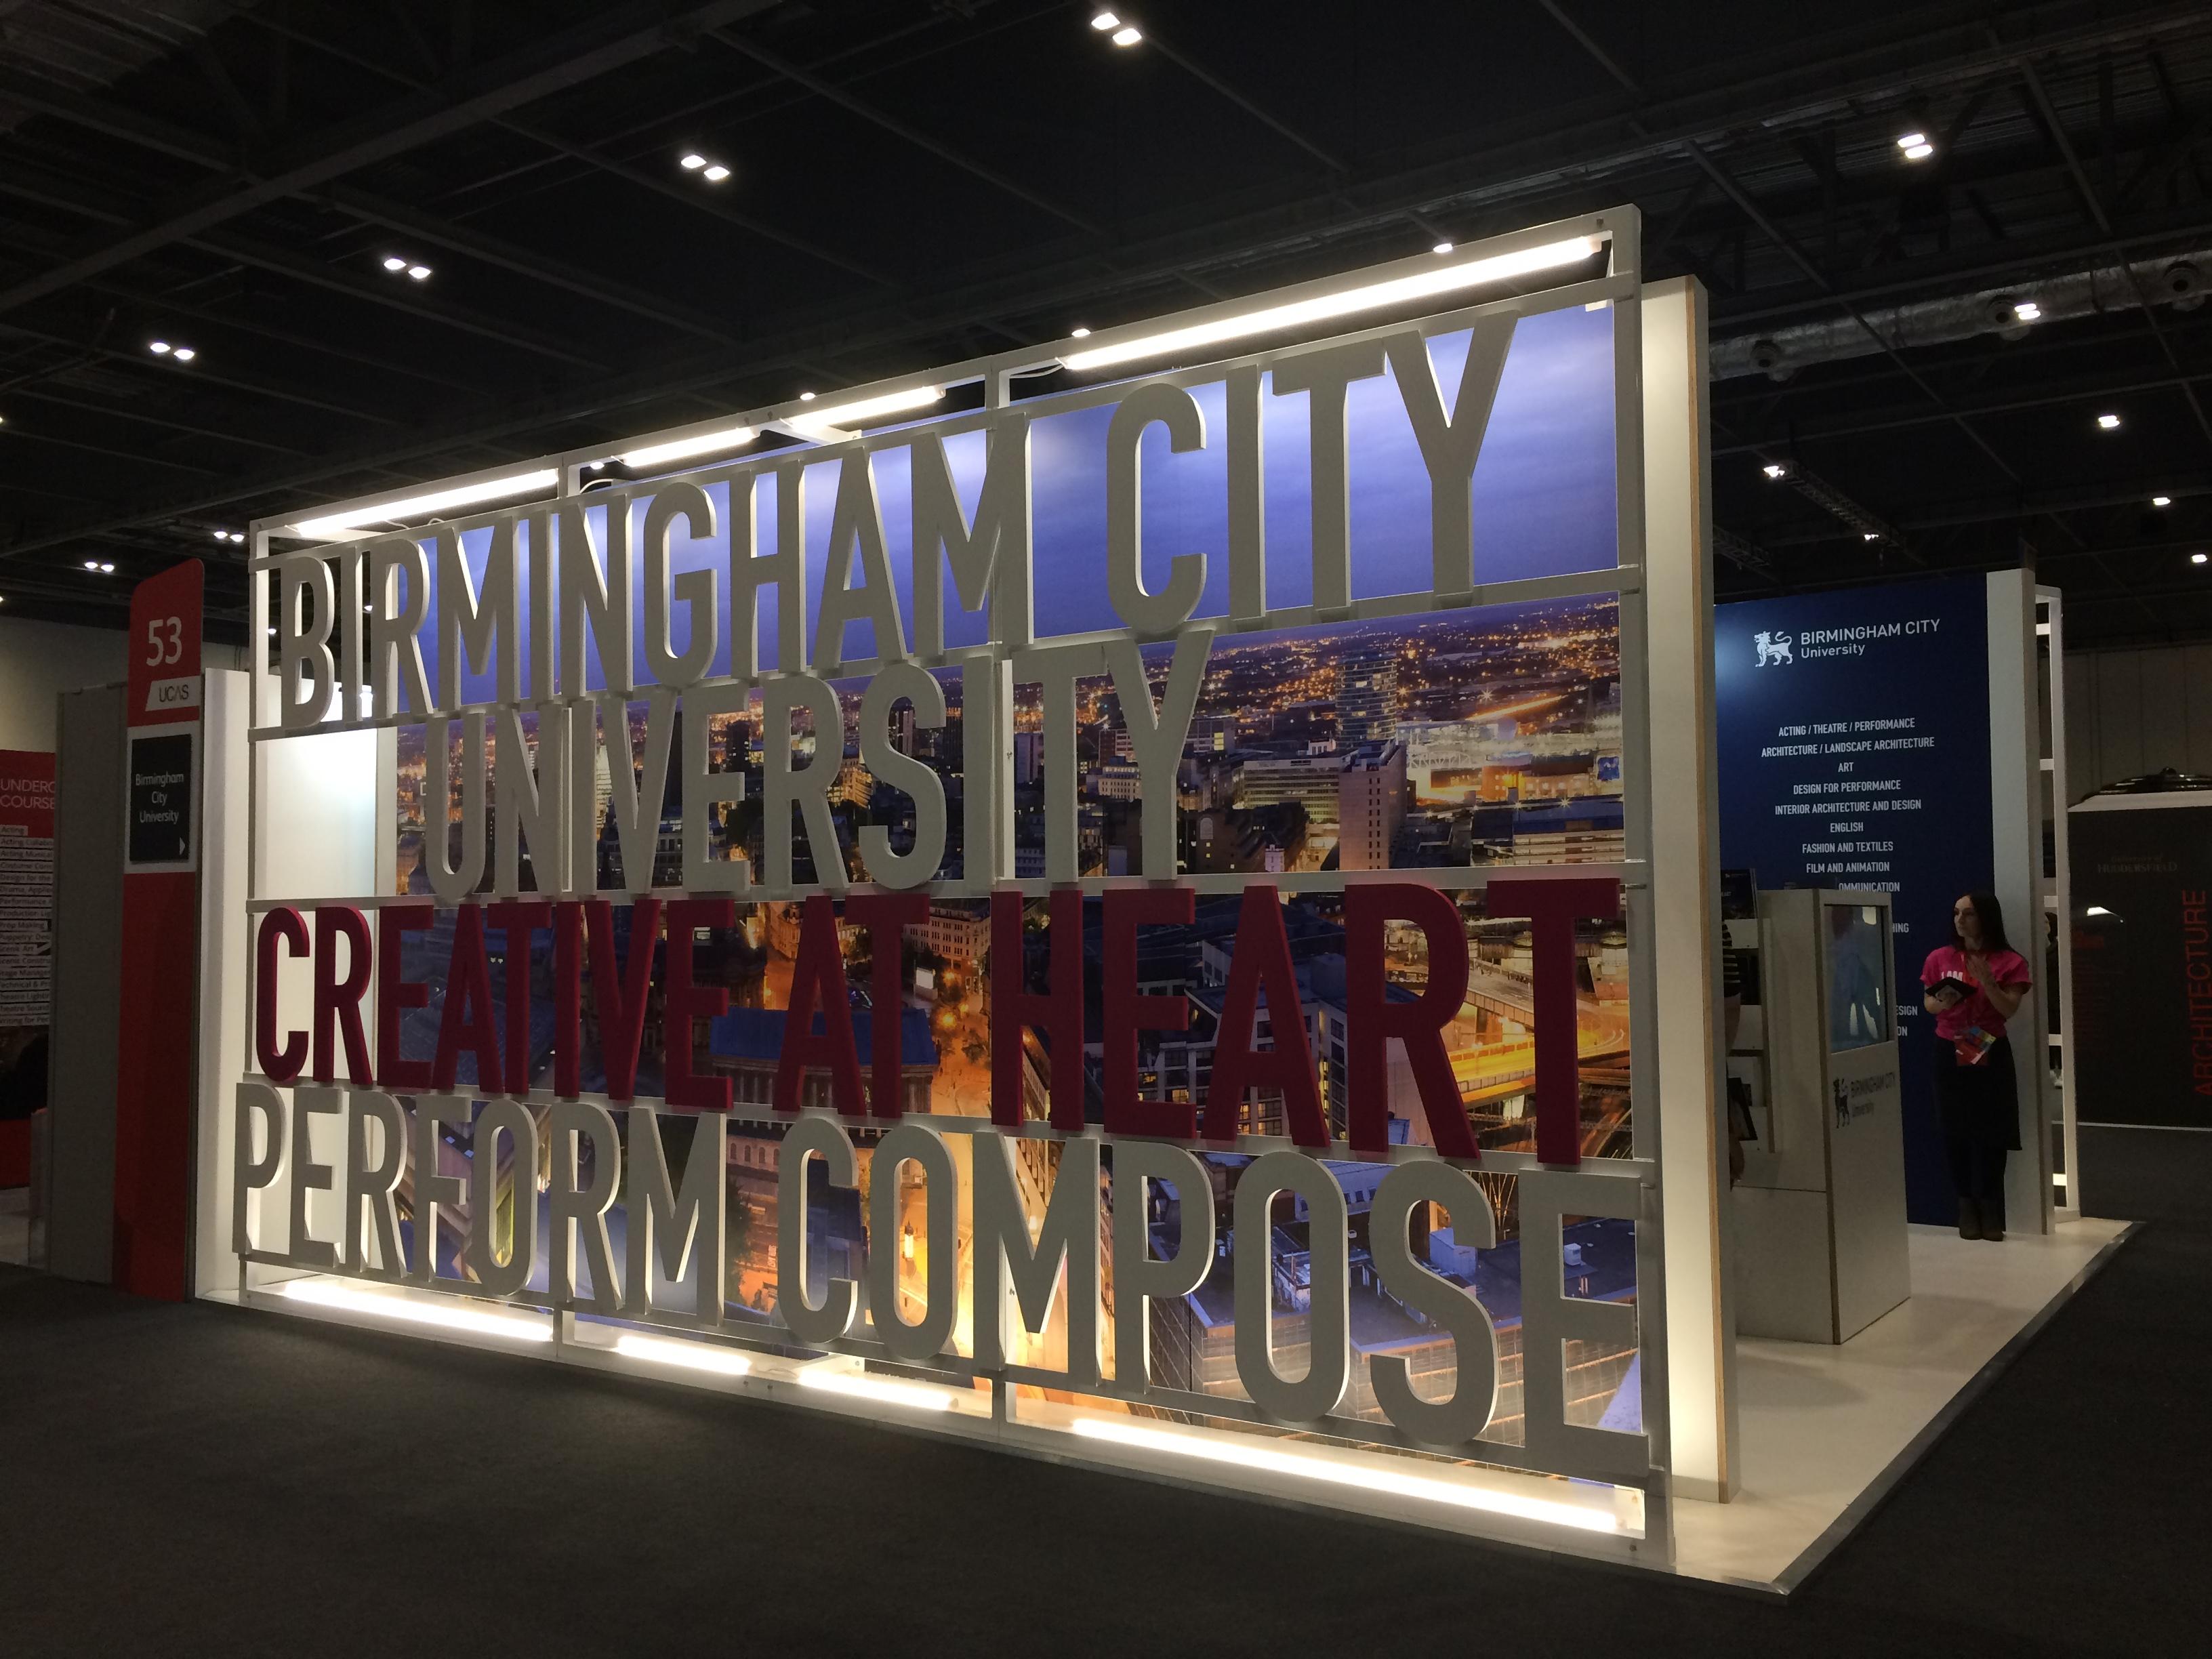 Exhibition Stand University : Plane structure birmingham city university exhibition stand